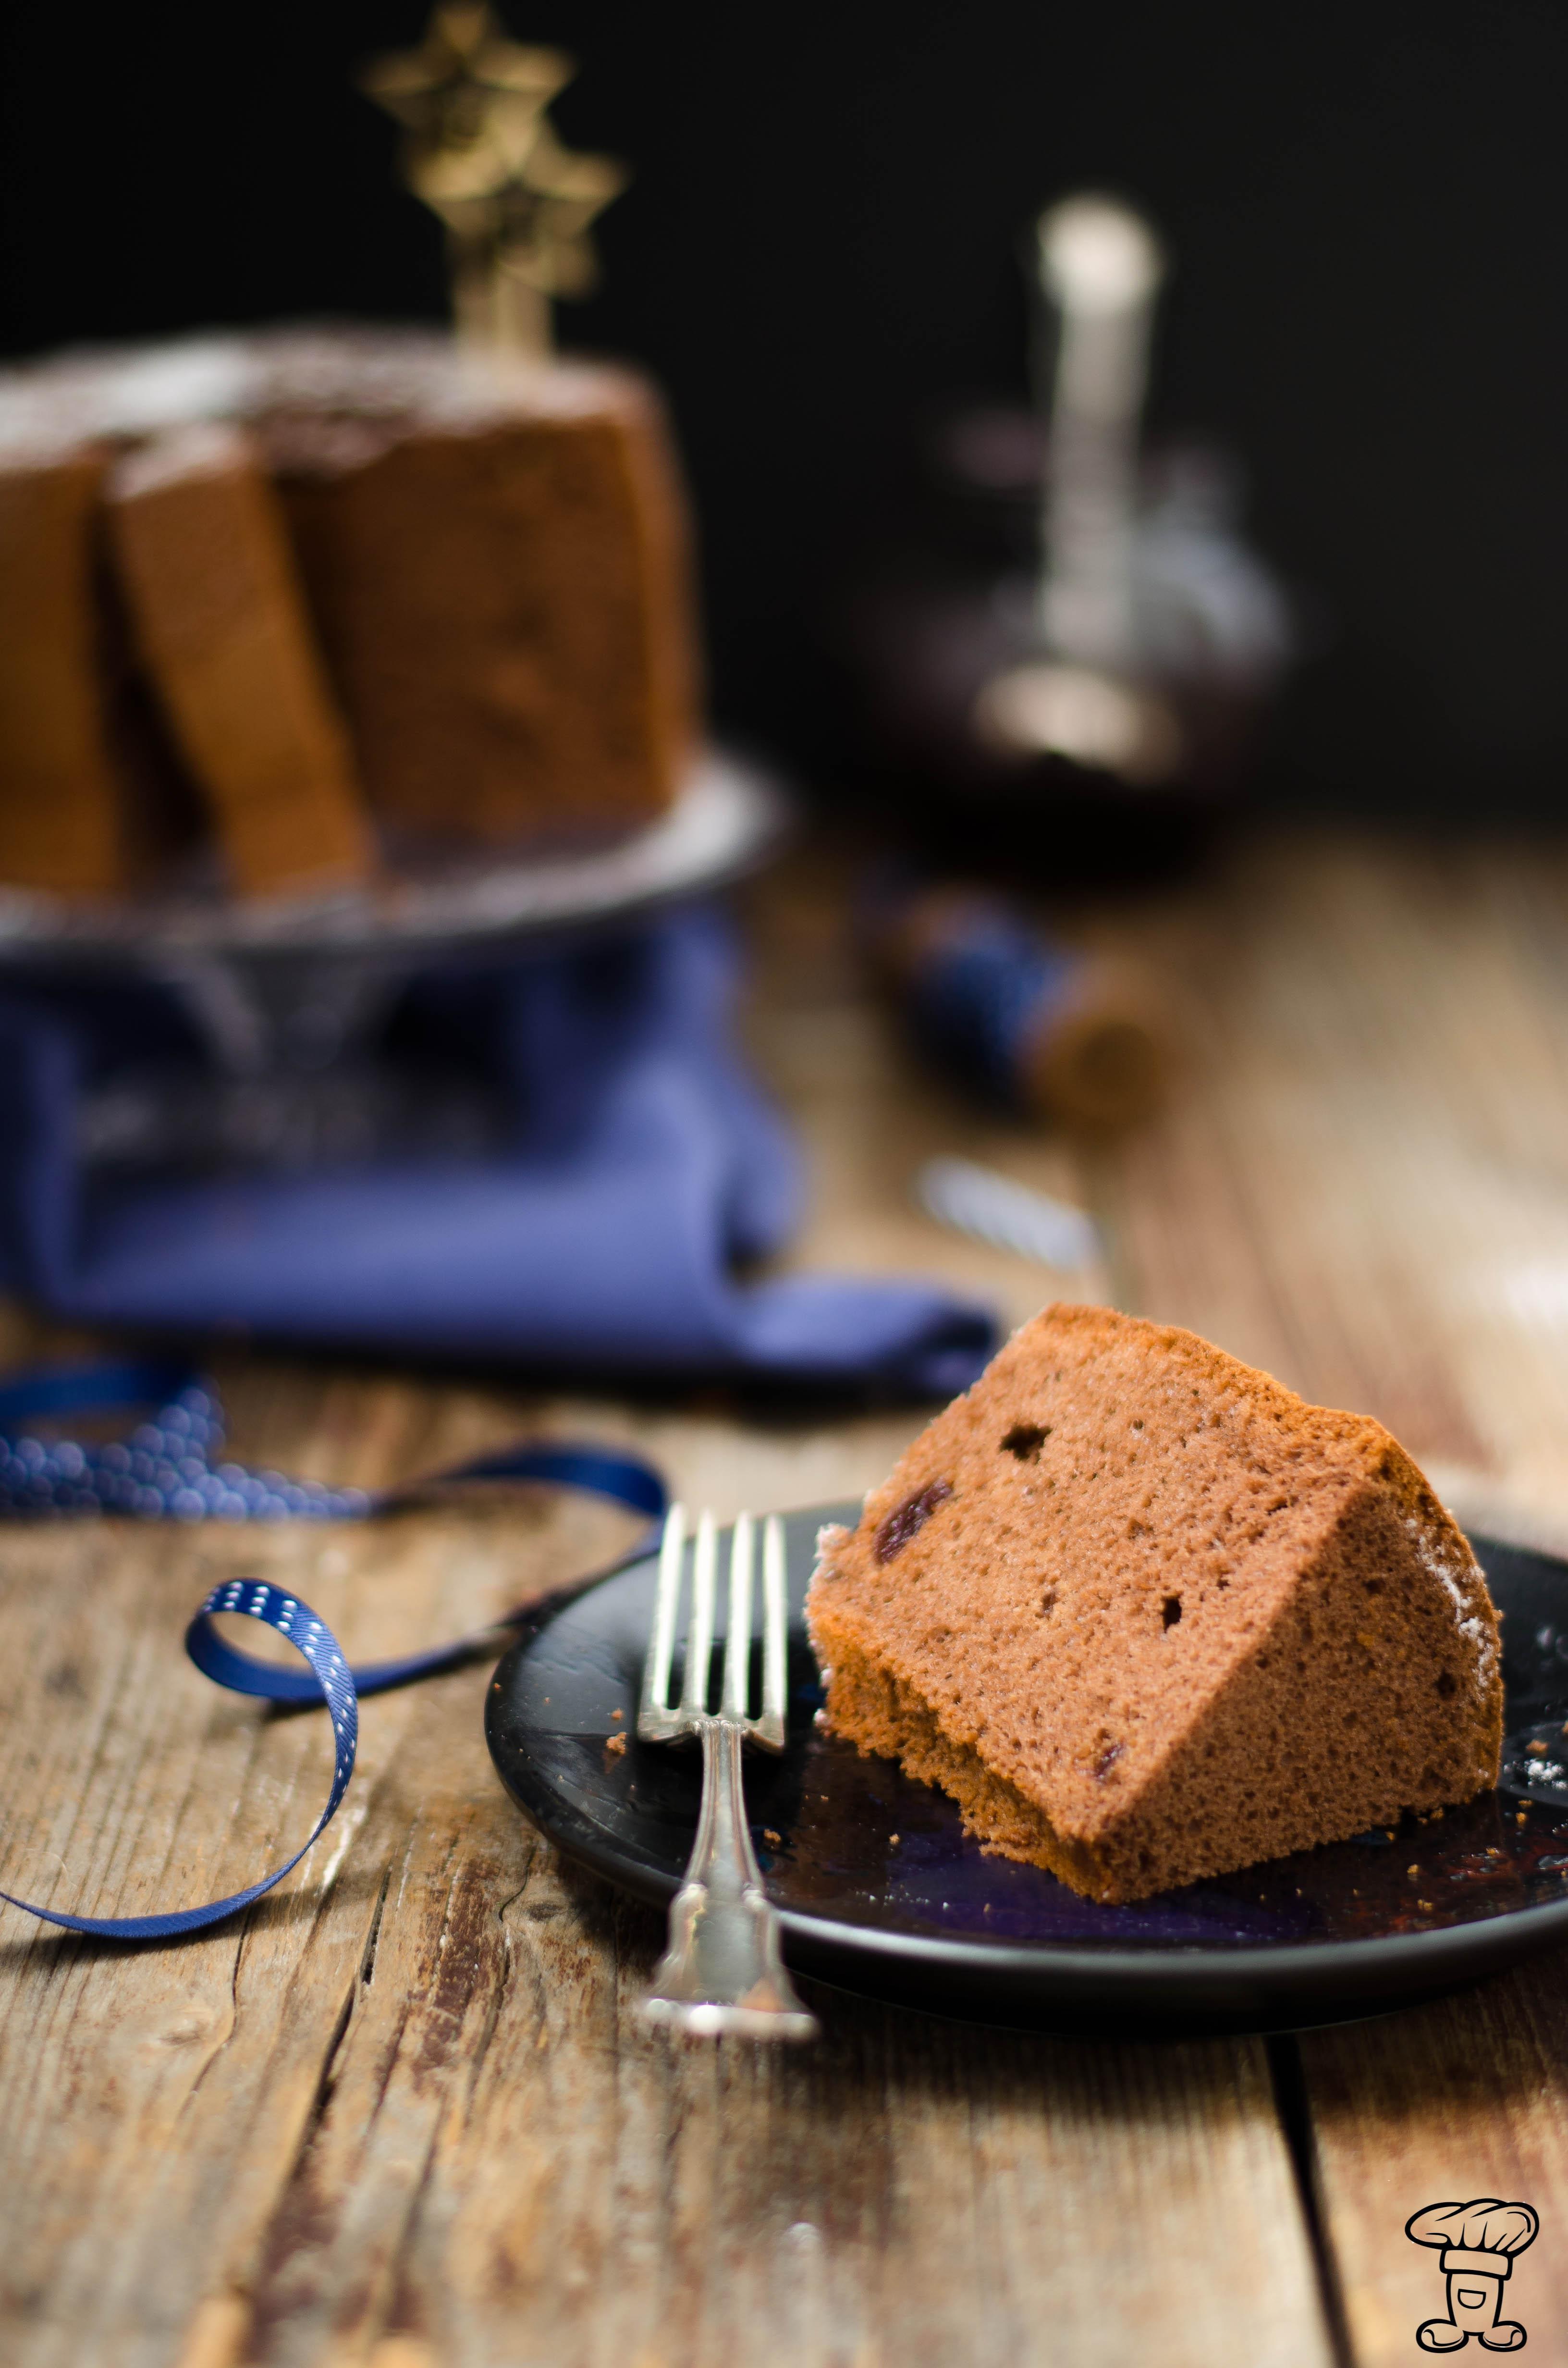 Fluffosa-birra_amarene_cioccolato2 Fluffosa alla birra, cacao ed amarene (Buon compleanno Ifood!)